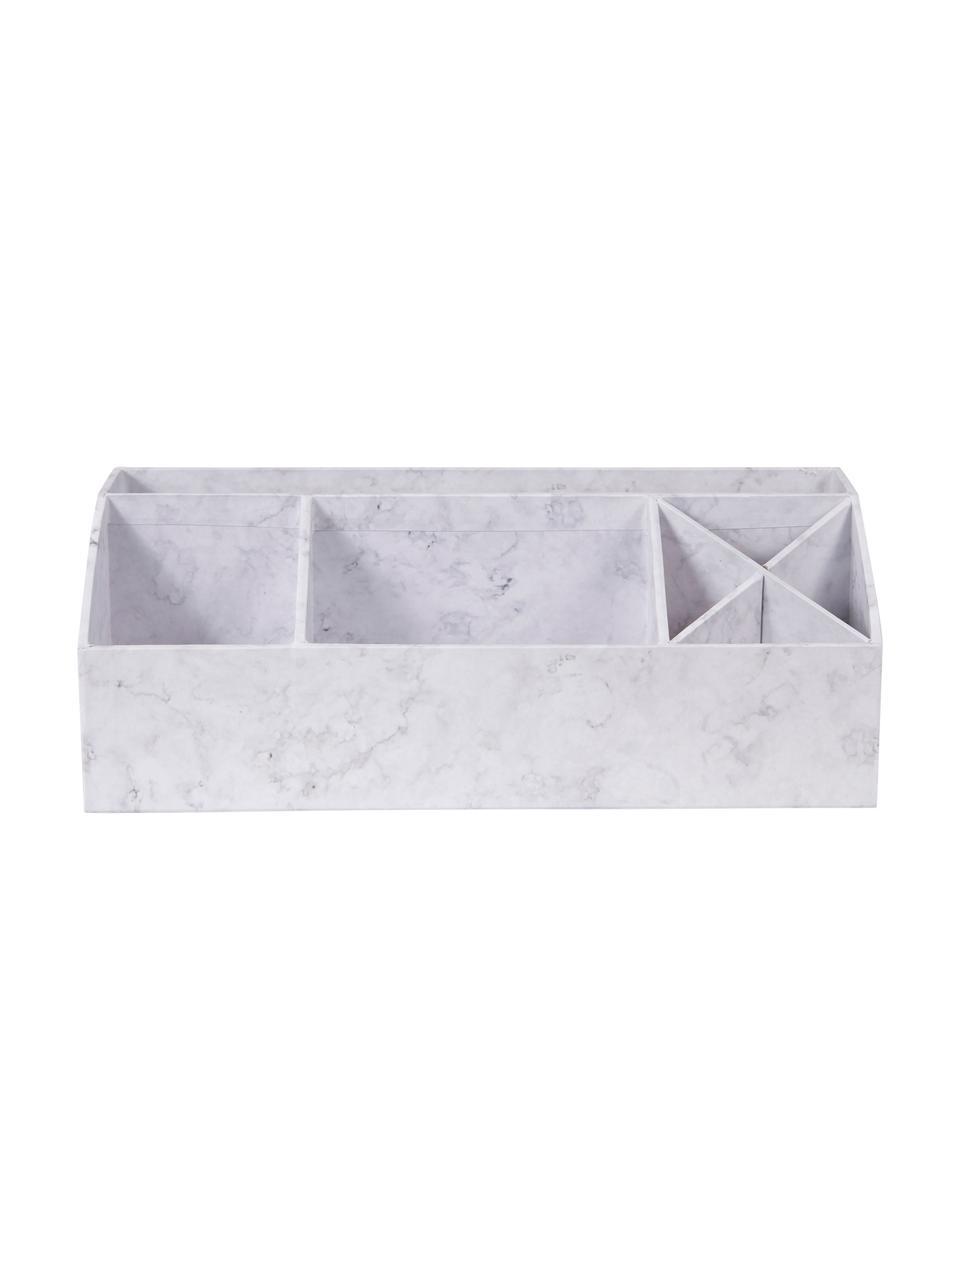 Büro-Organizer Elisa, Fester, laminierter Karton, Weiß, marmoriert, 33 x 13 cm